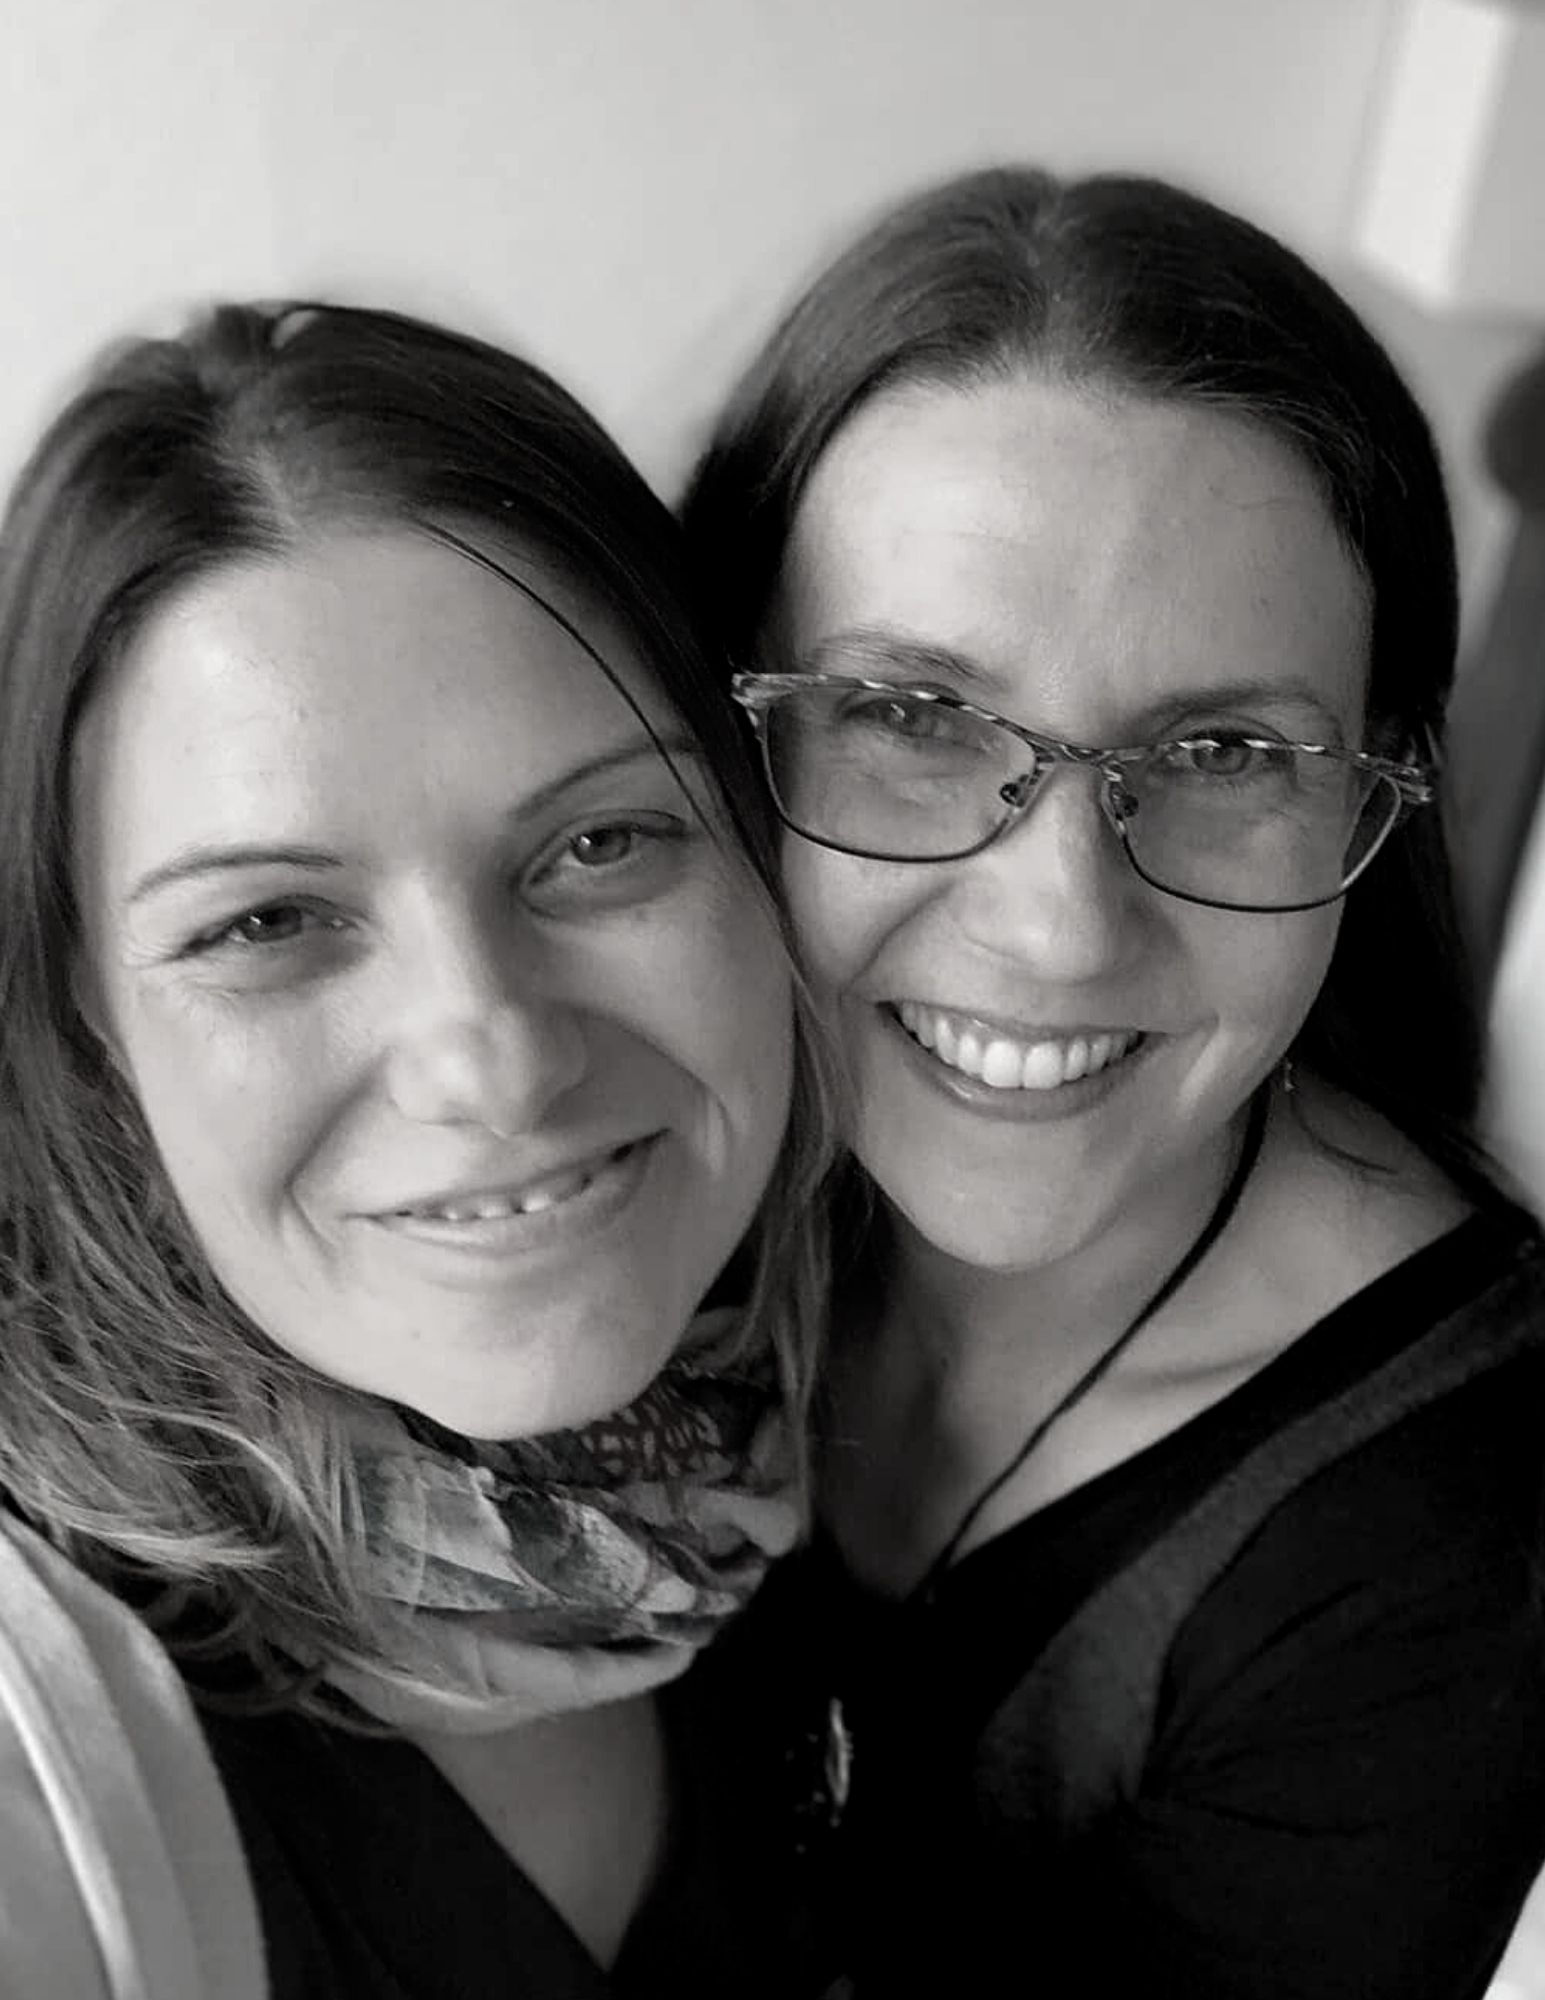 Jamie Fenix + Amanda Lux